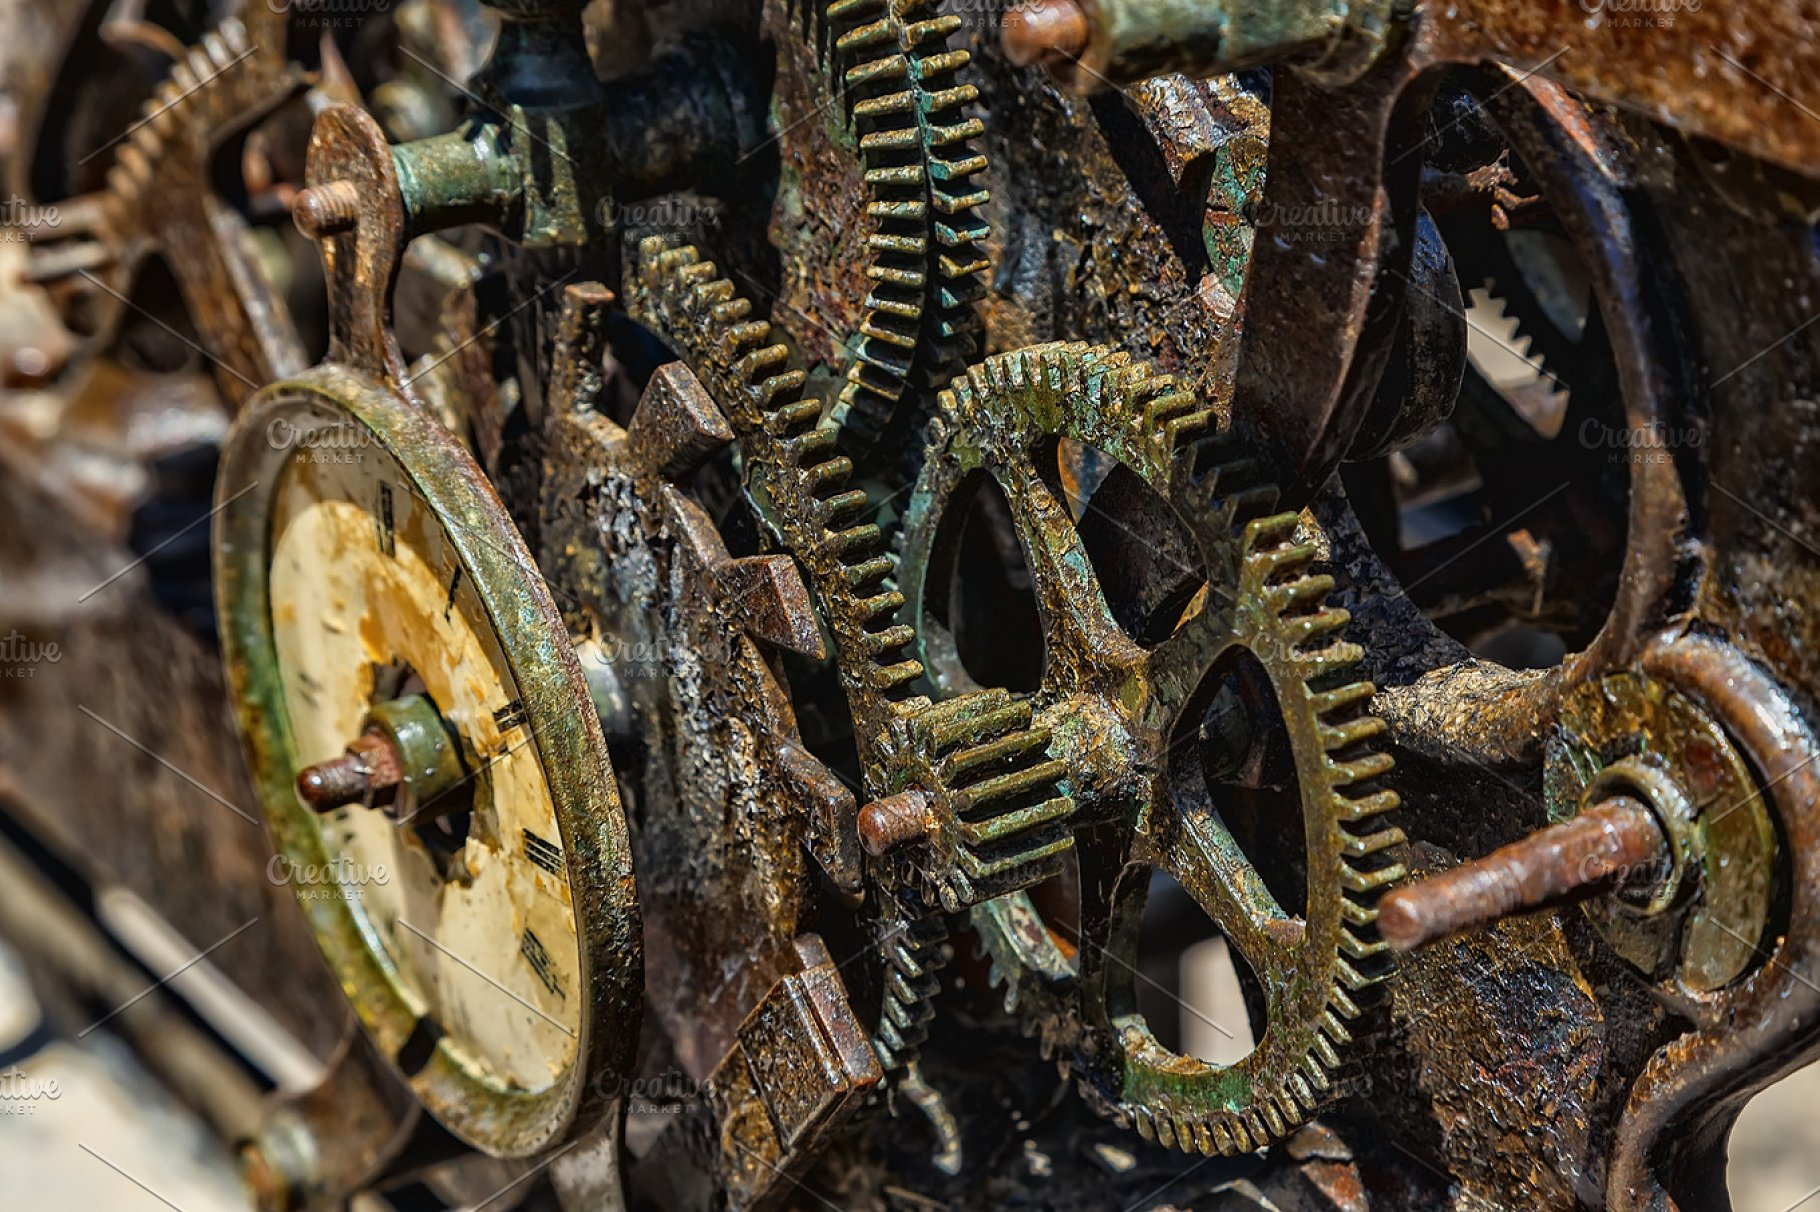 Close-up of an ancient clock gears metal mechanism